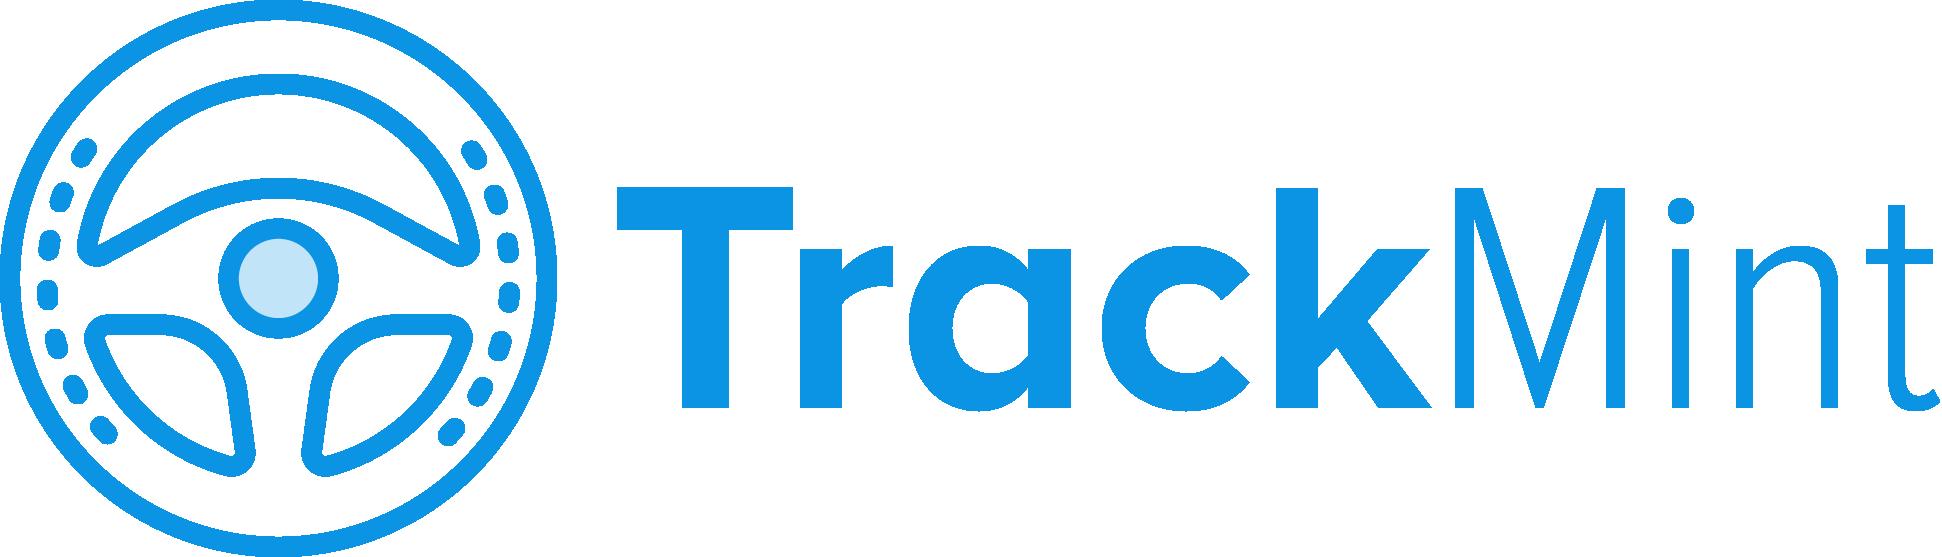 TrackMint, India